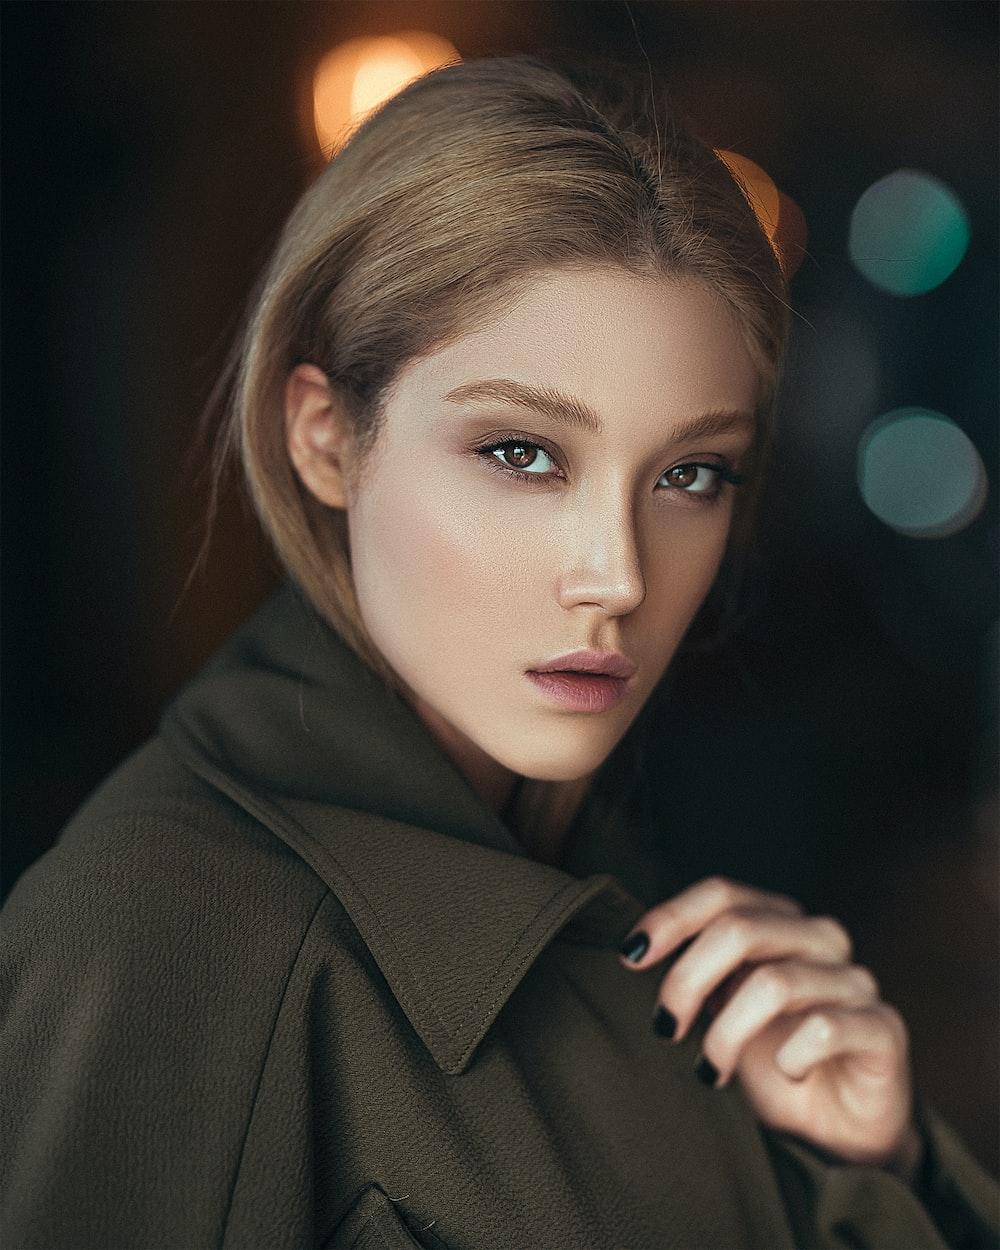 woman wearing gray collared coat